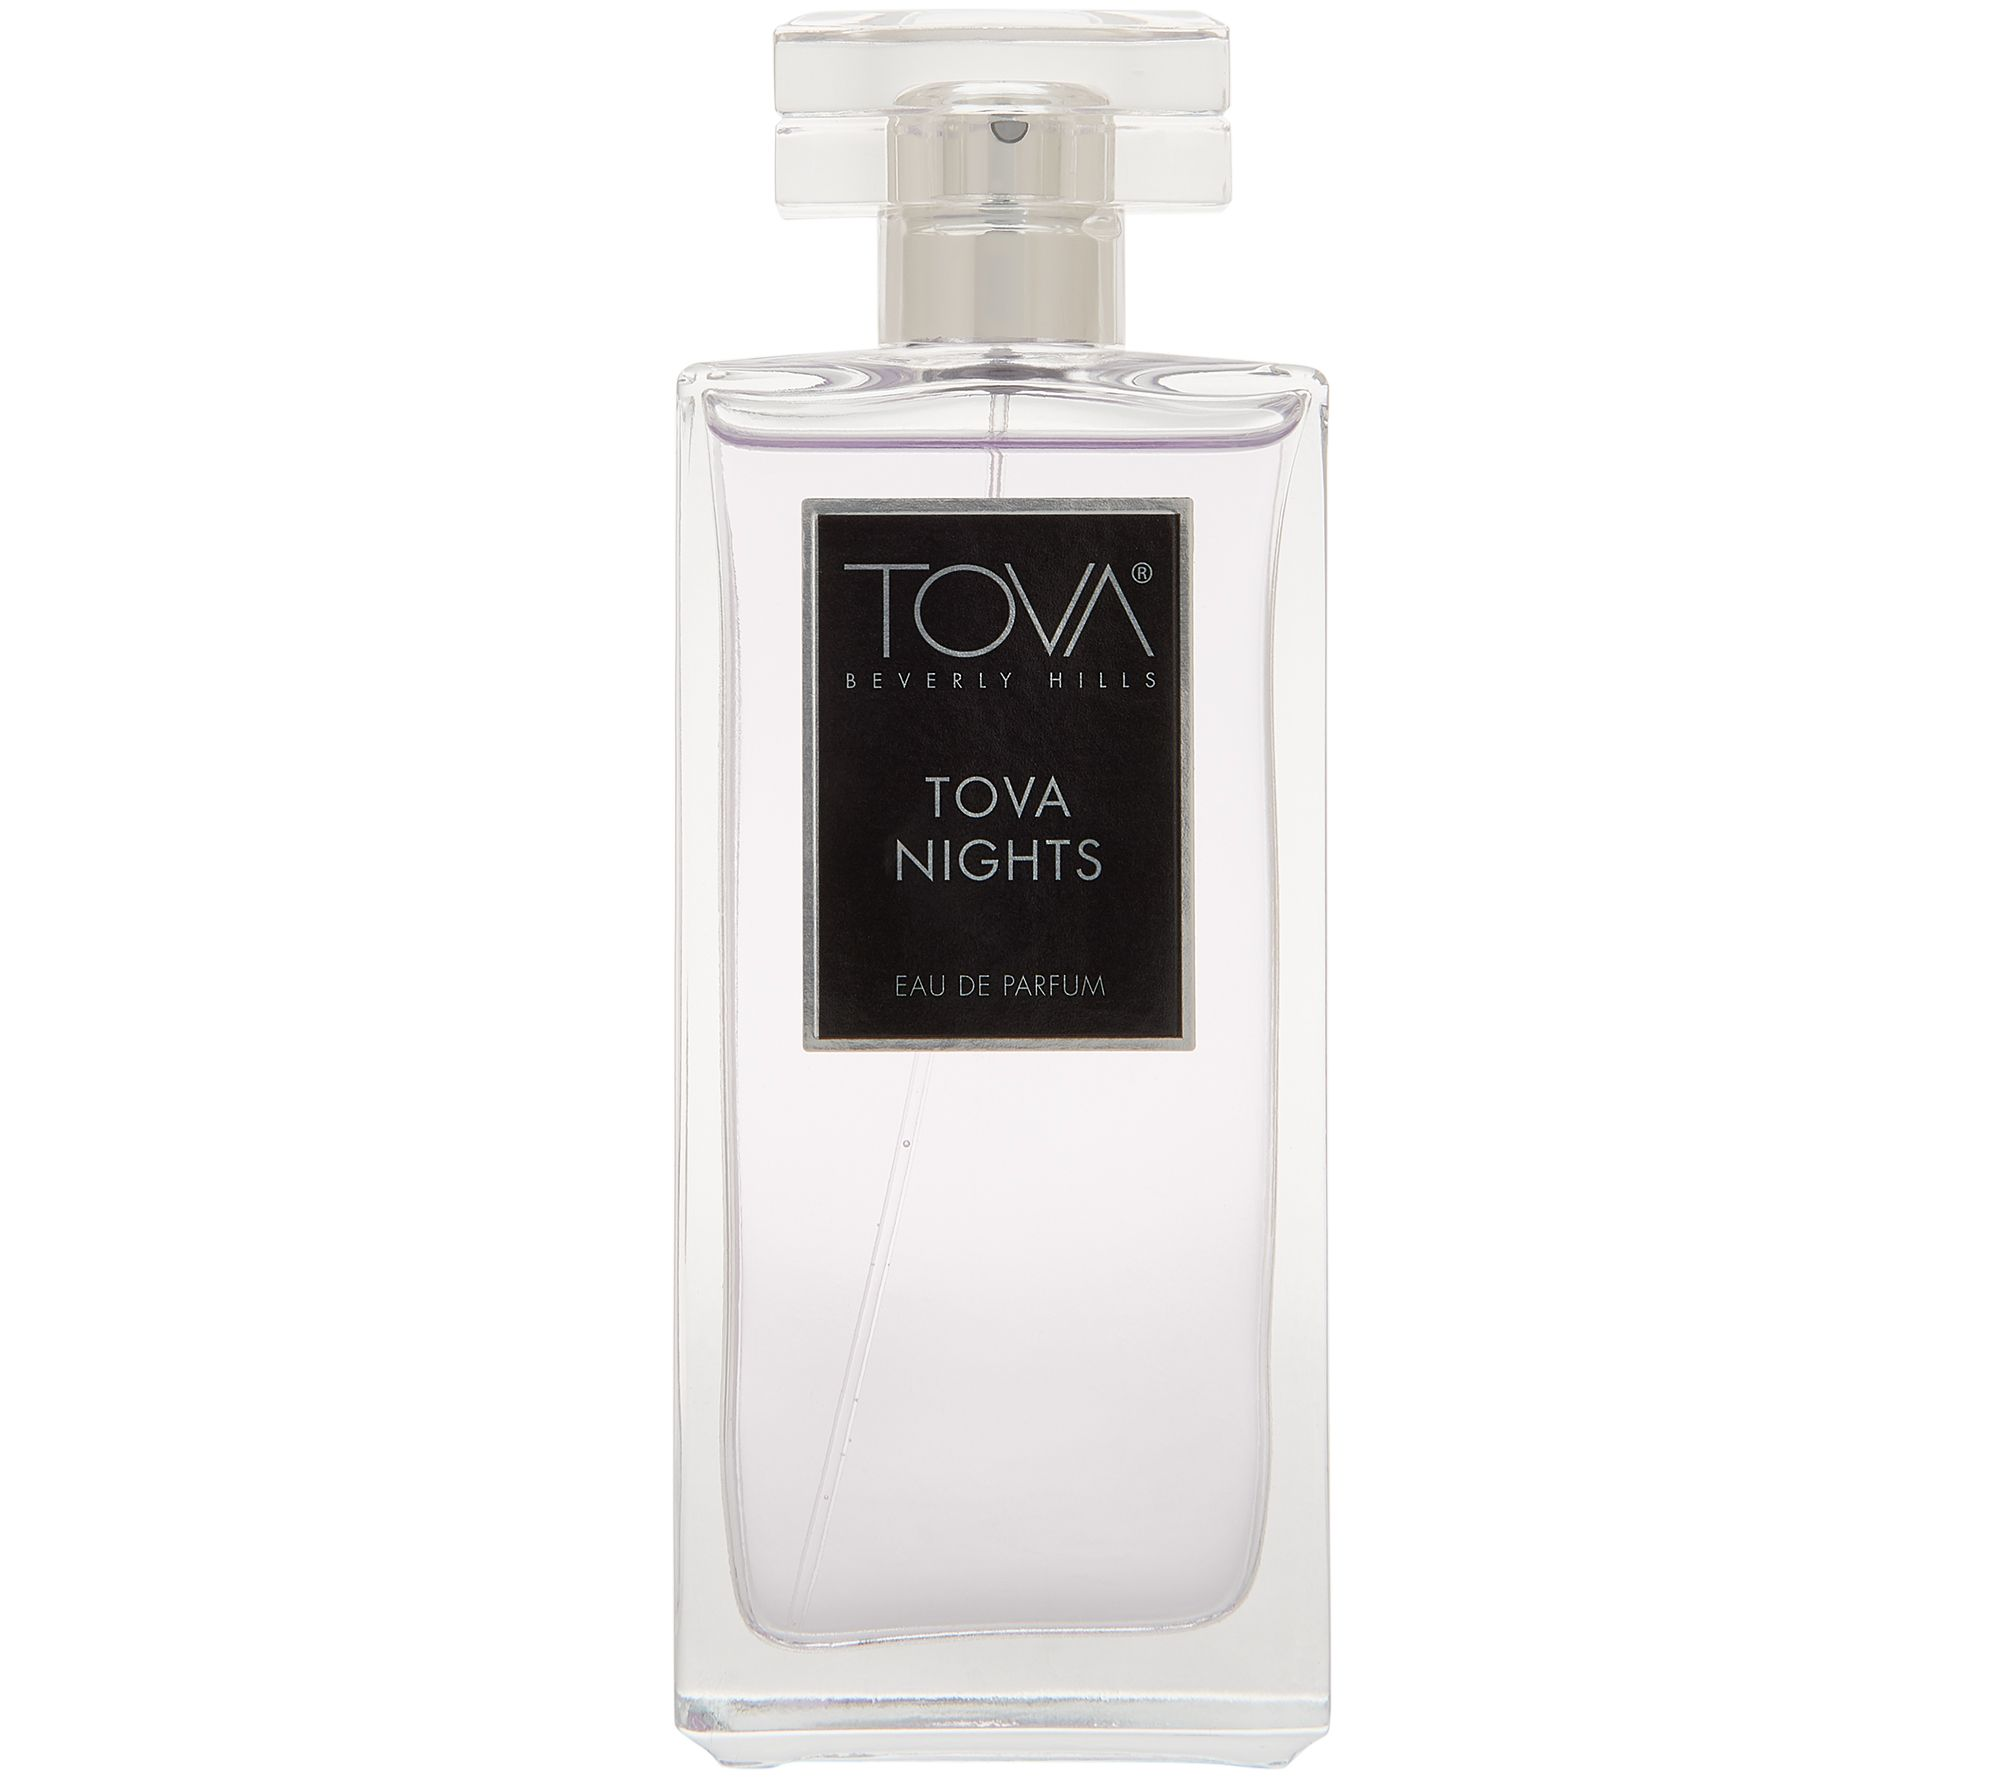 TOVA Nights Eau de Parfum 3.4-fl oz